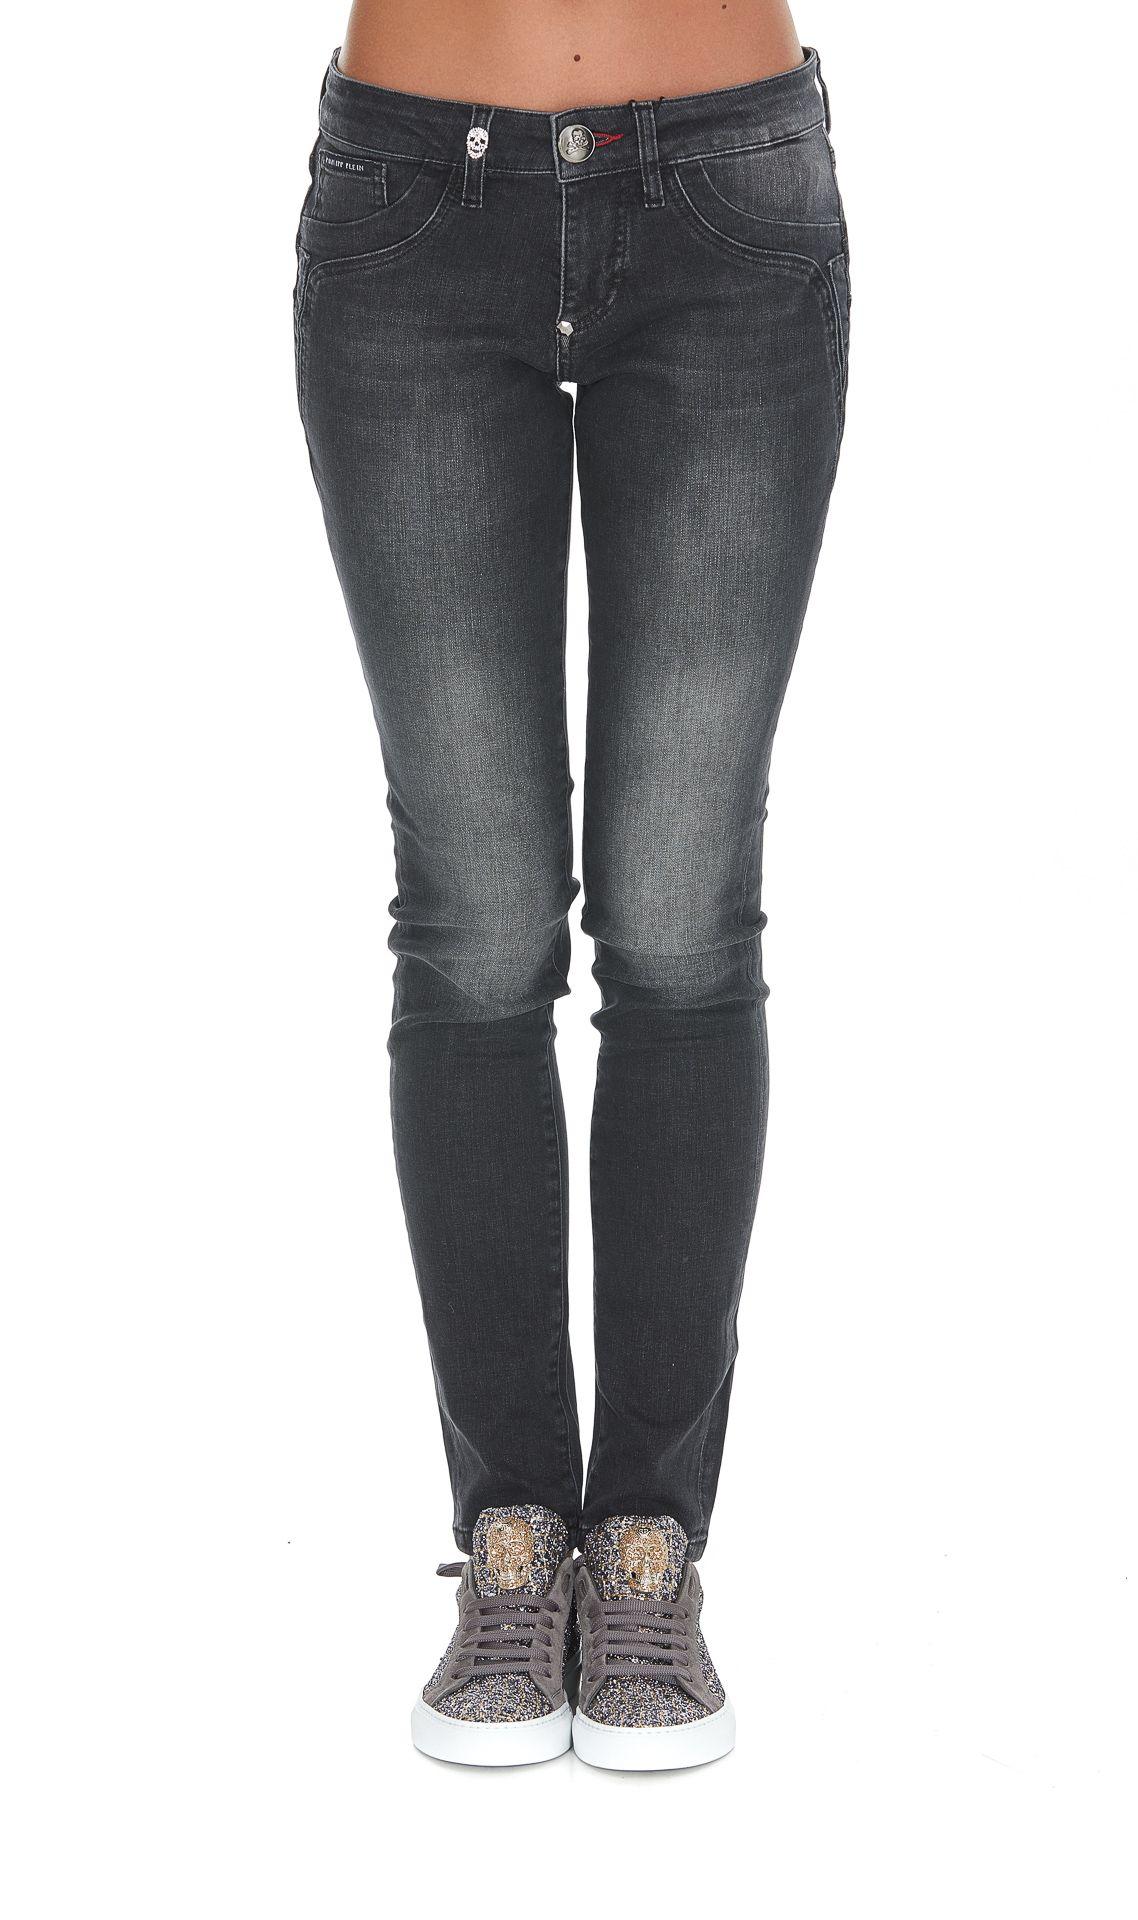 Philipp Plein Chicago Sexy Jeans